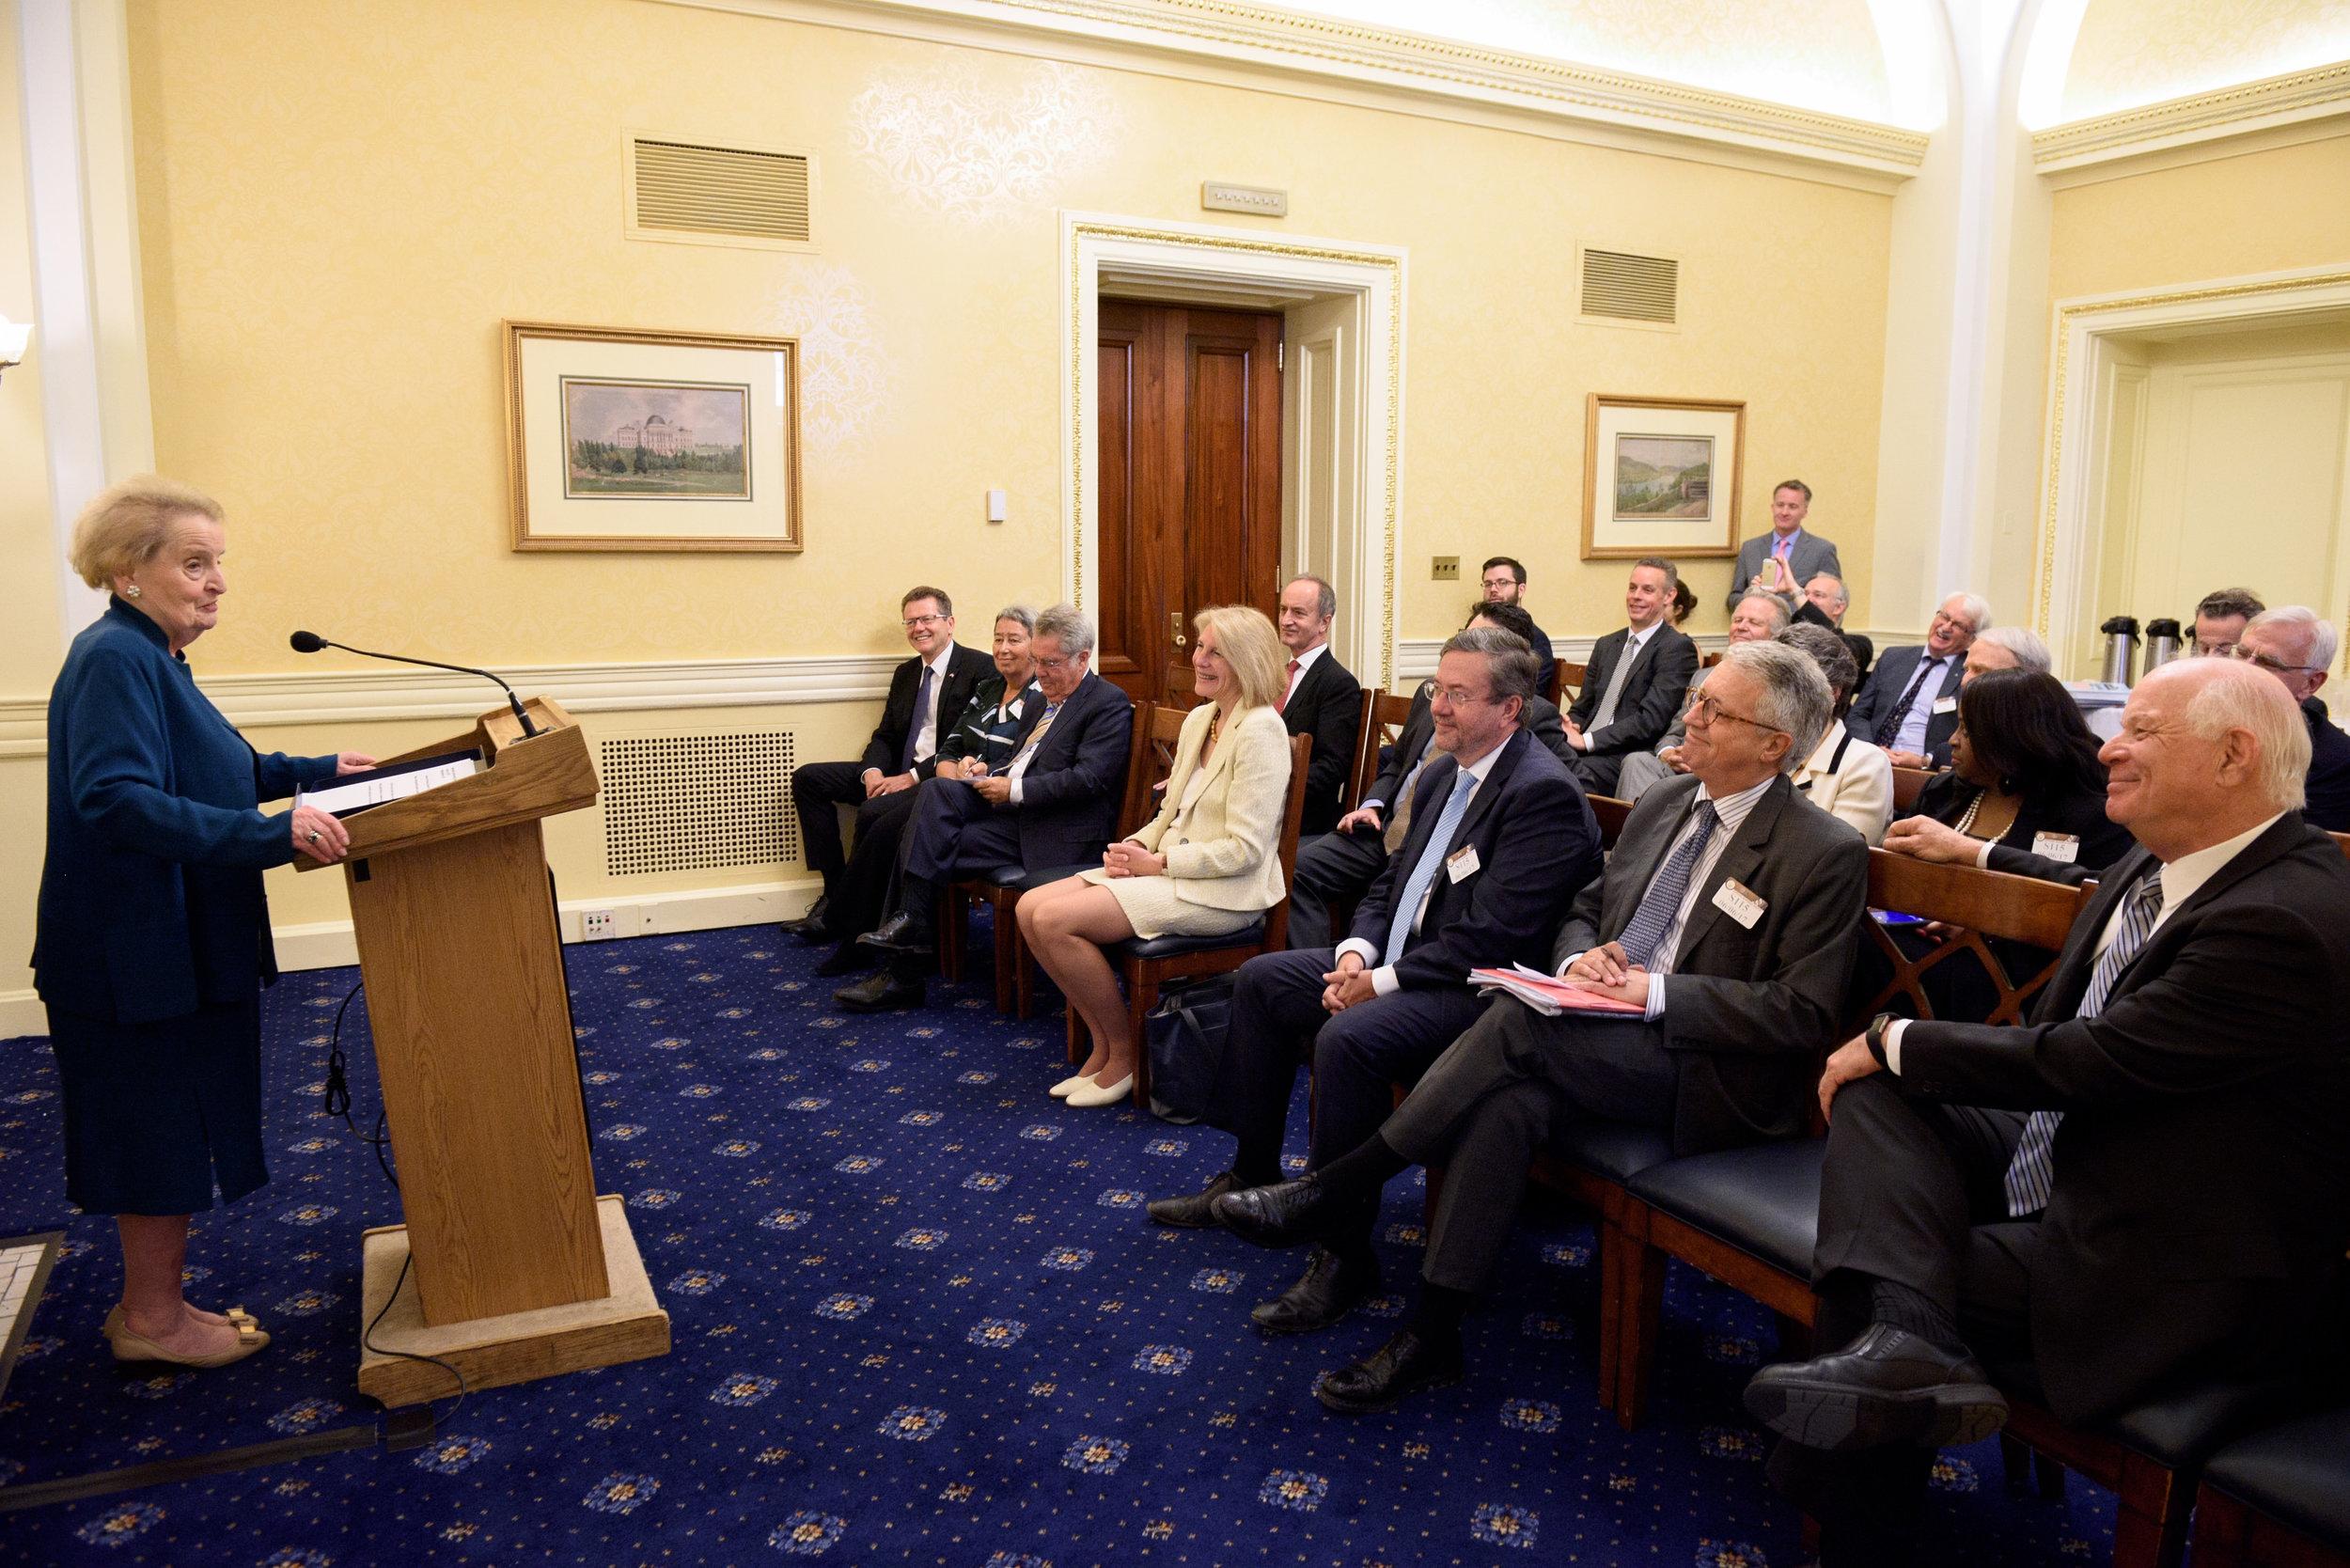 Dr. Madeleine Albright addresses the audience (c)Kaveh Sardari Photography